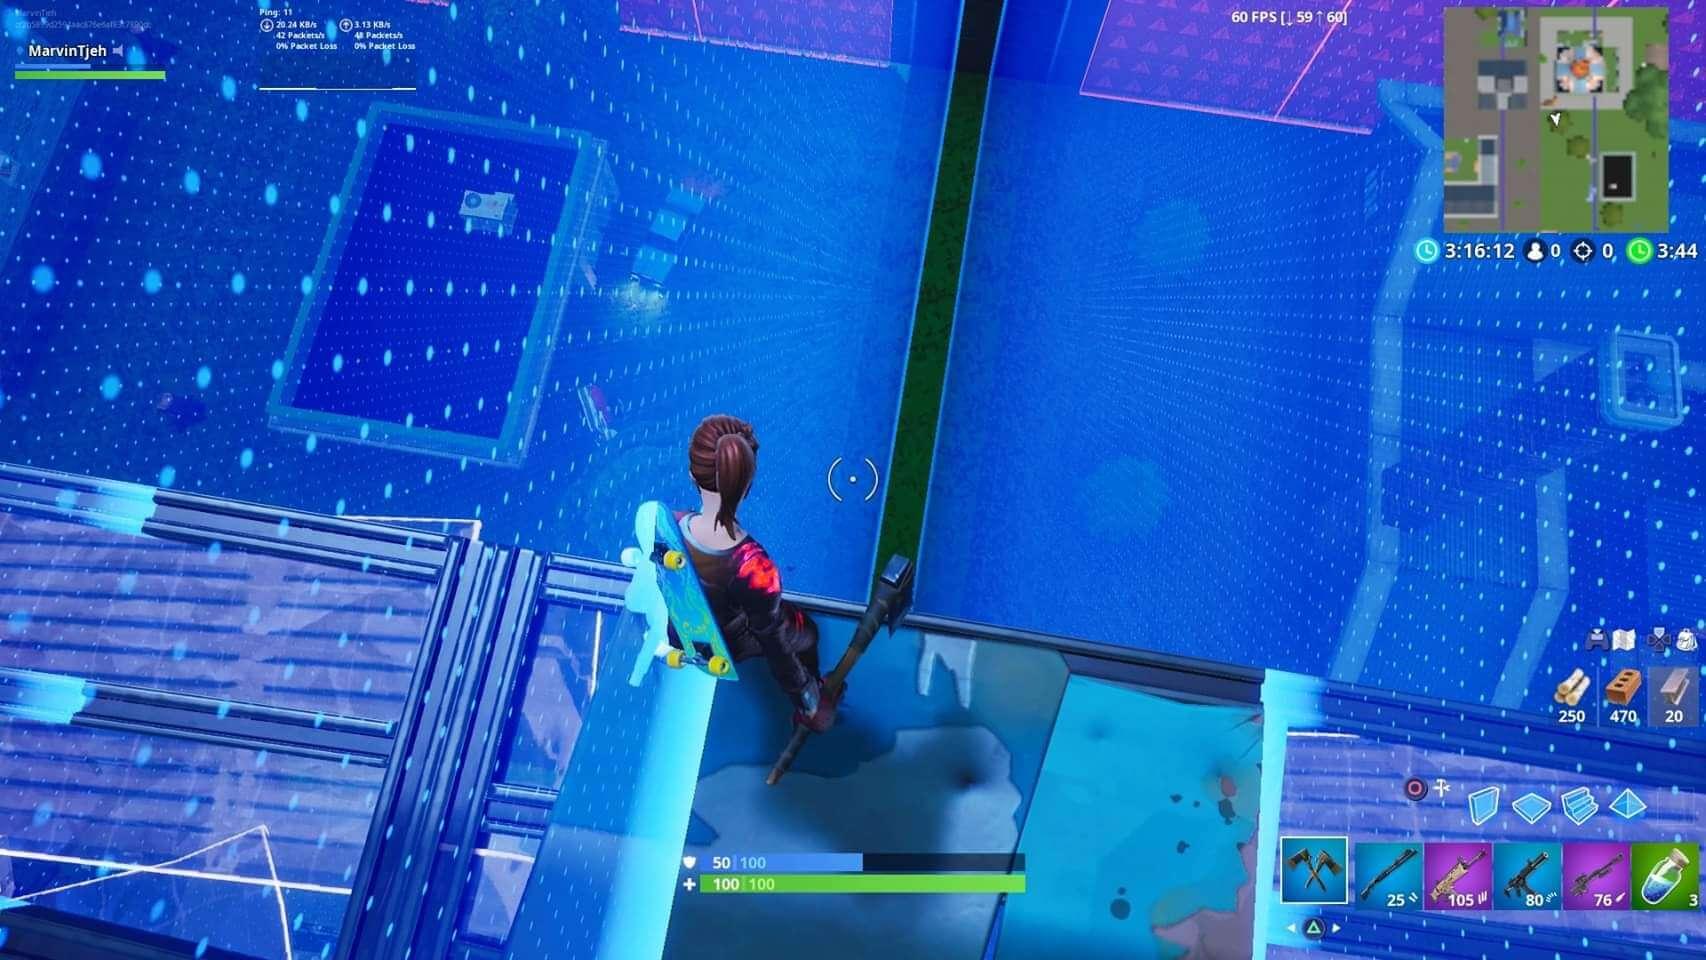 Fortnite Scrims Simulator Ffa Scrims With Ticking Zones V1 Fortnite Creative Map Code Dropnite